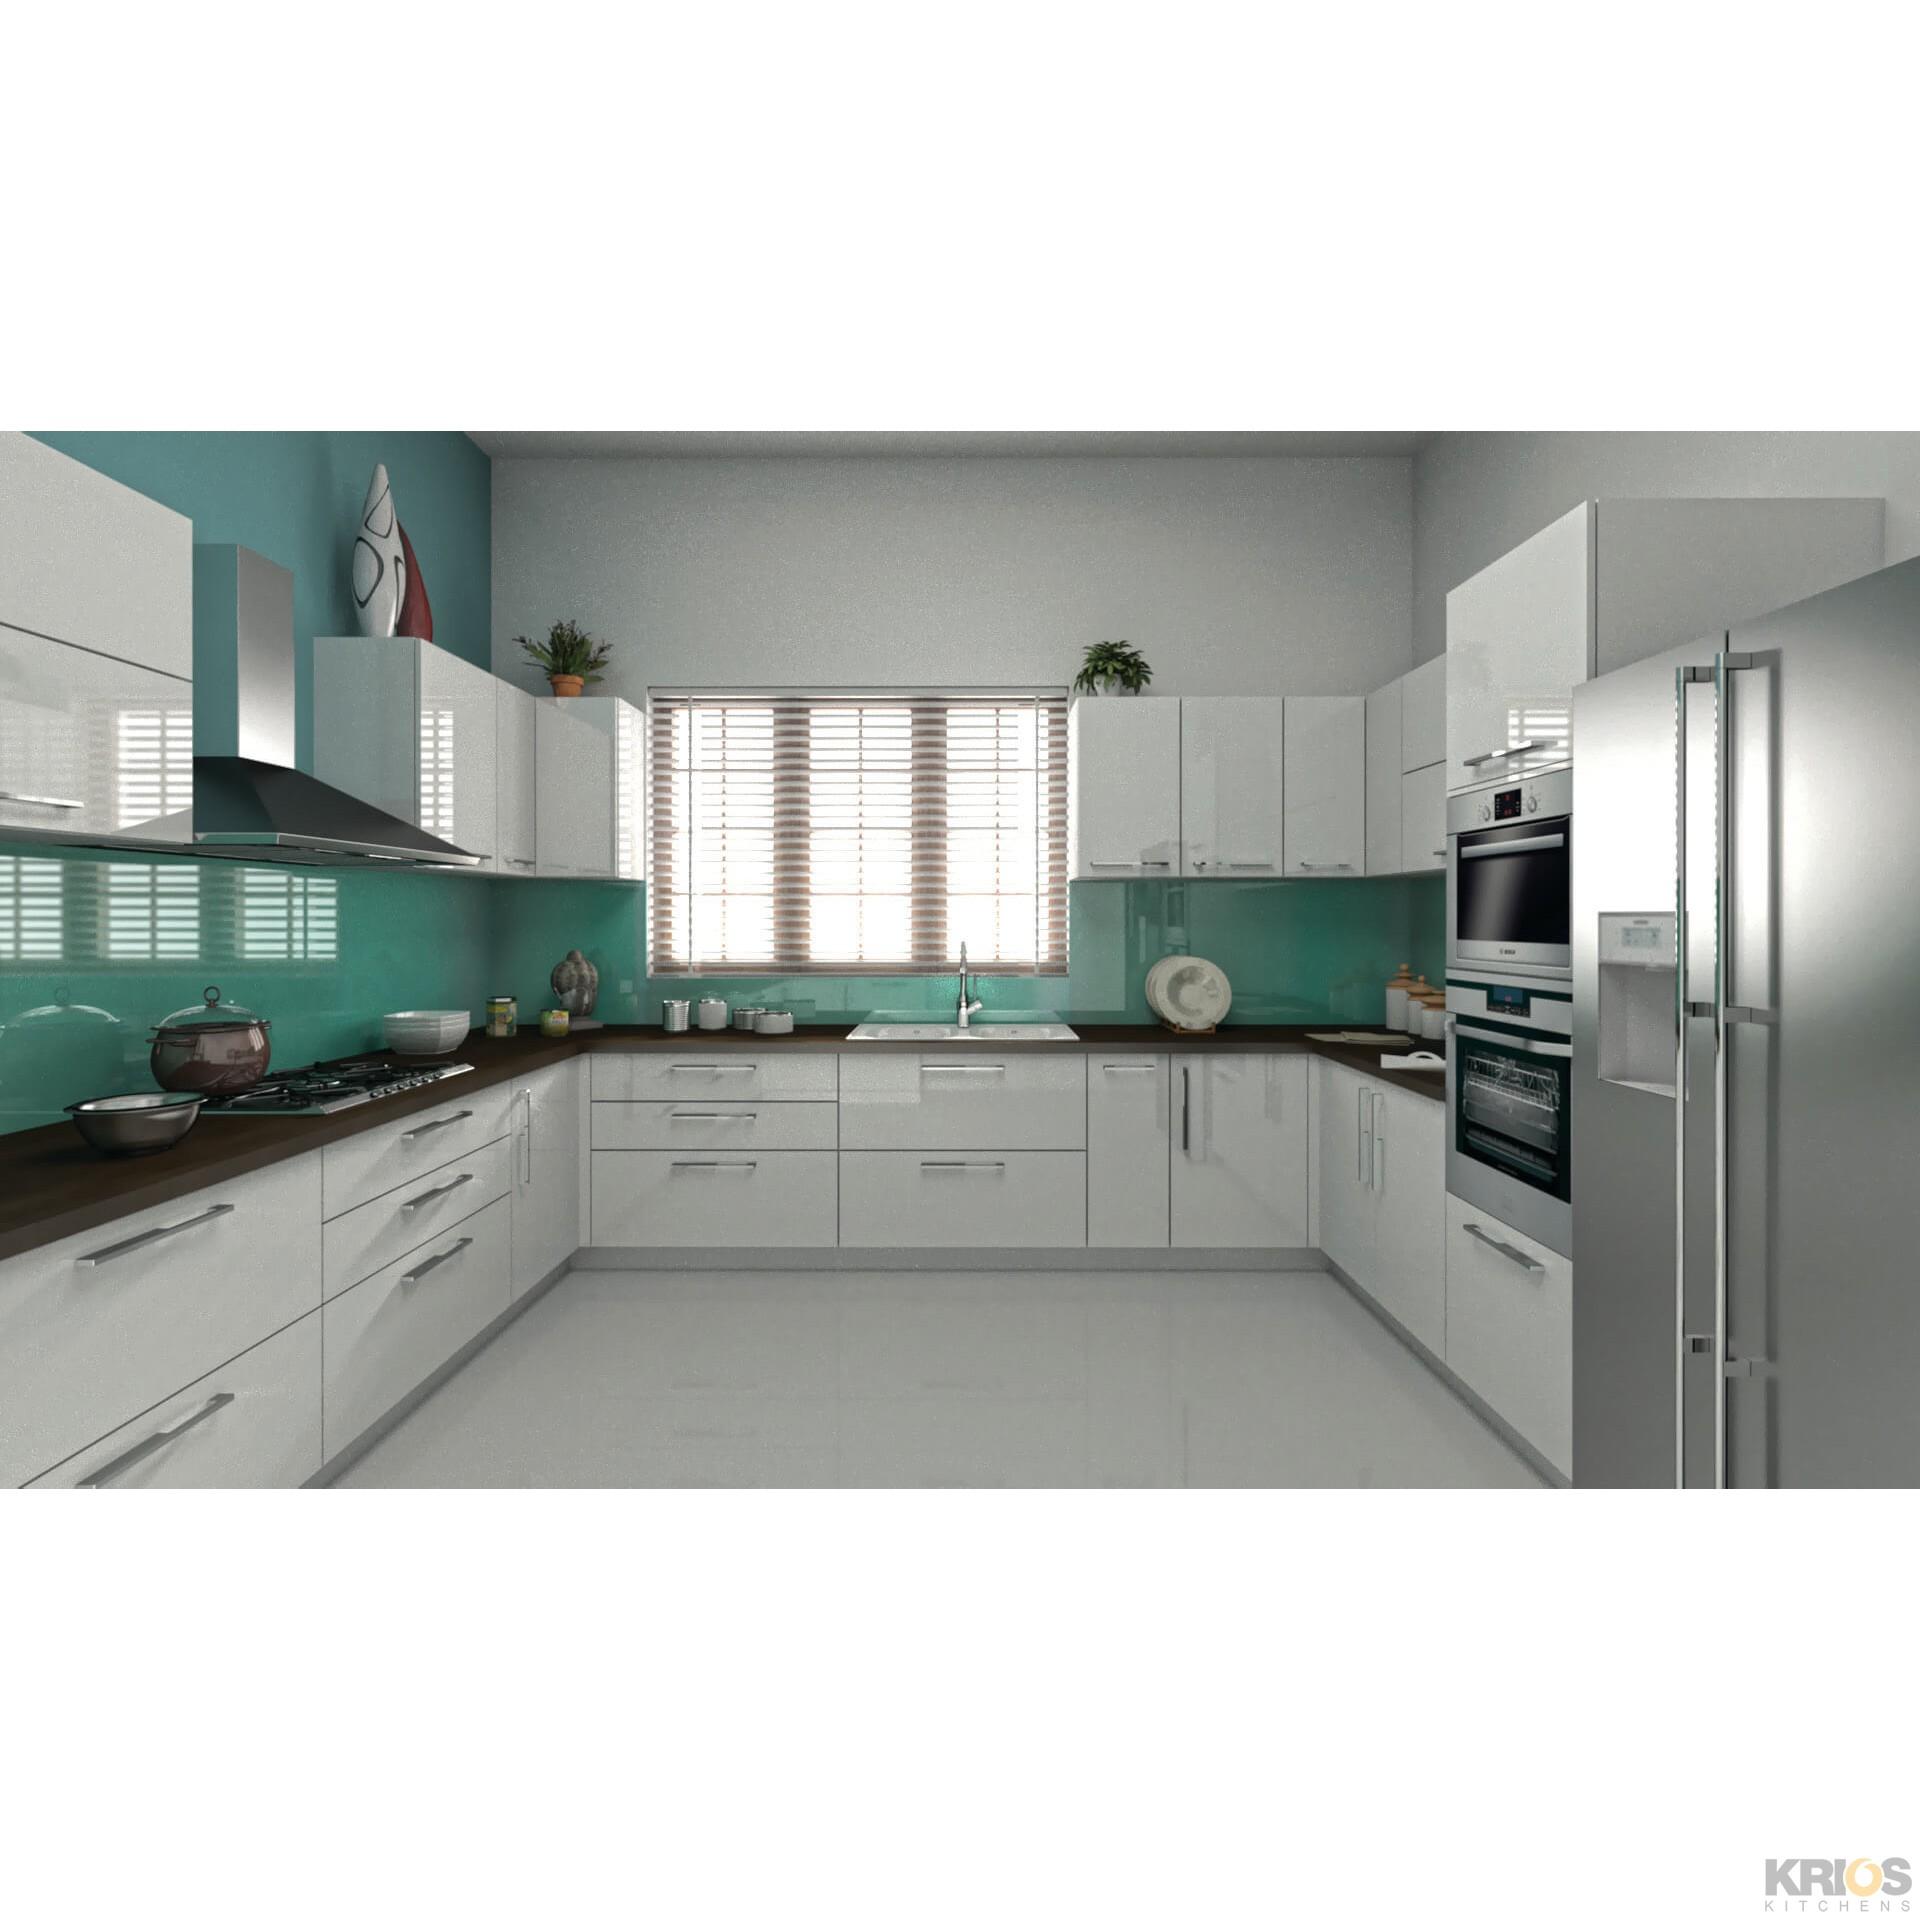 Island Modular Kitchen Designs: Modular Kitchens